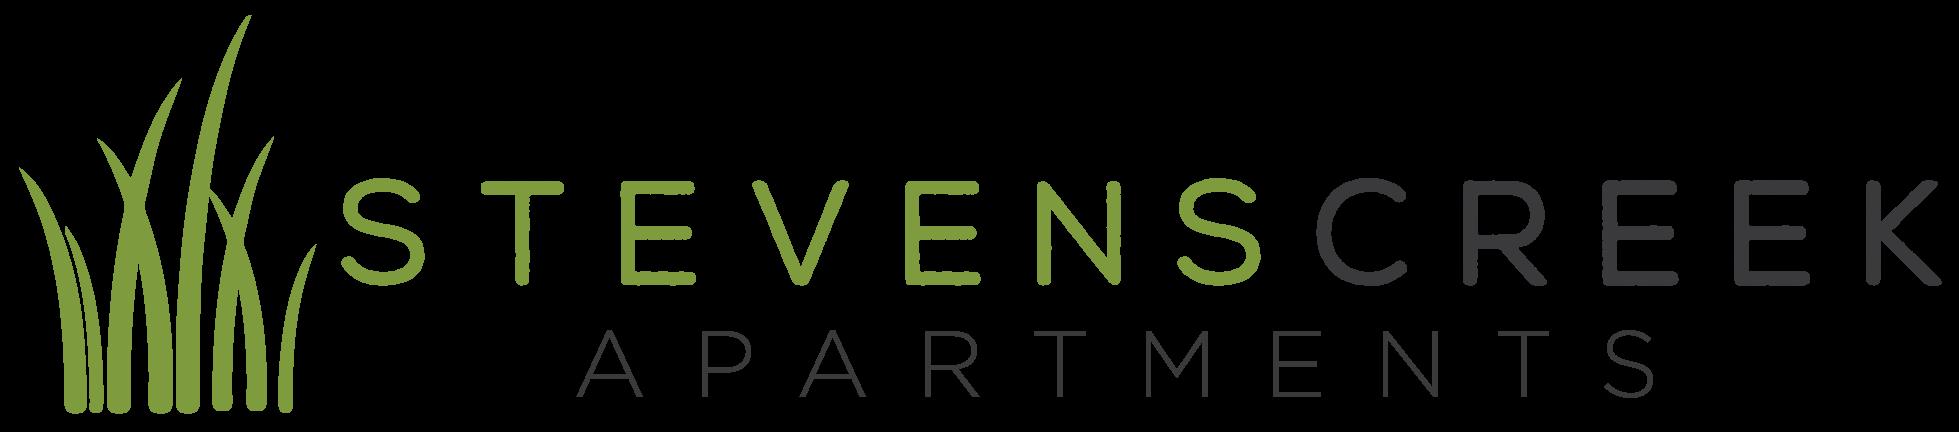 Stevens Creek Apartments